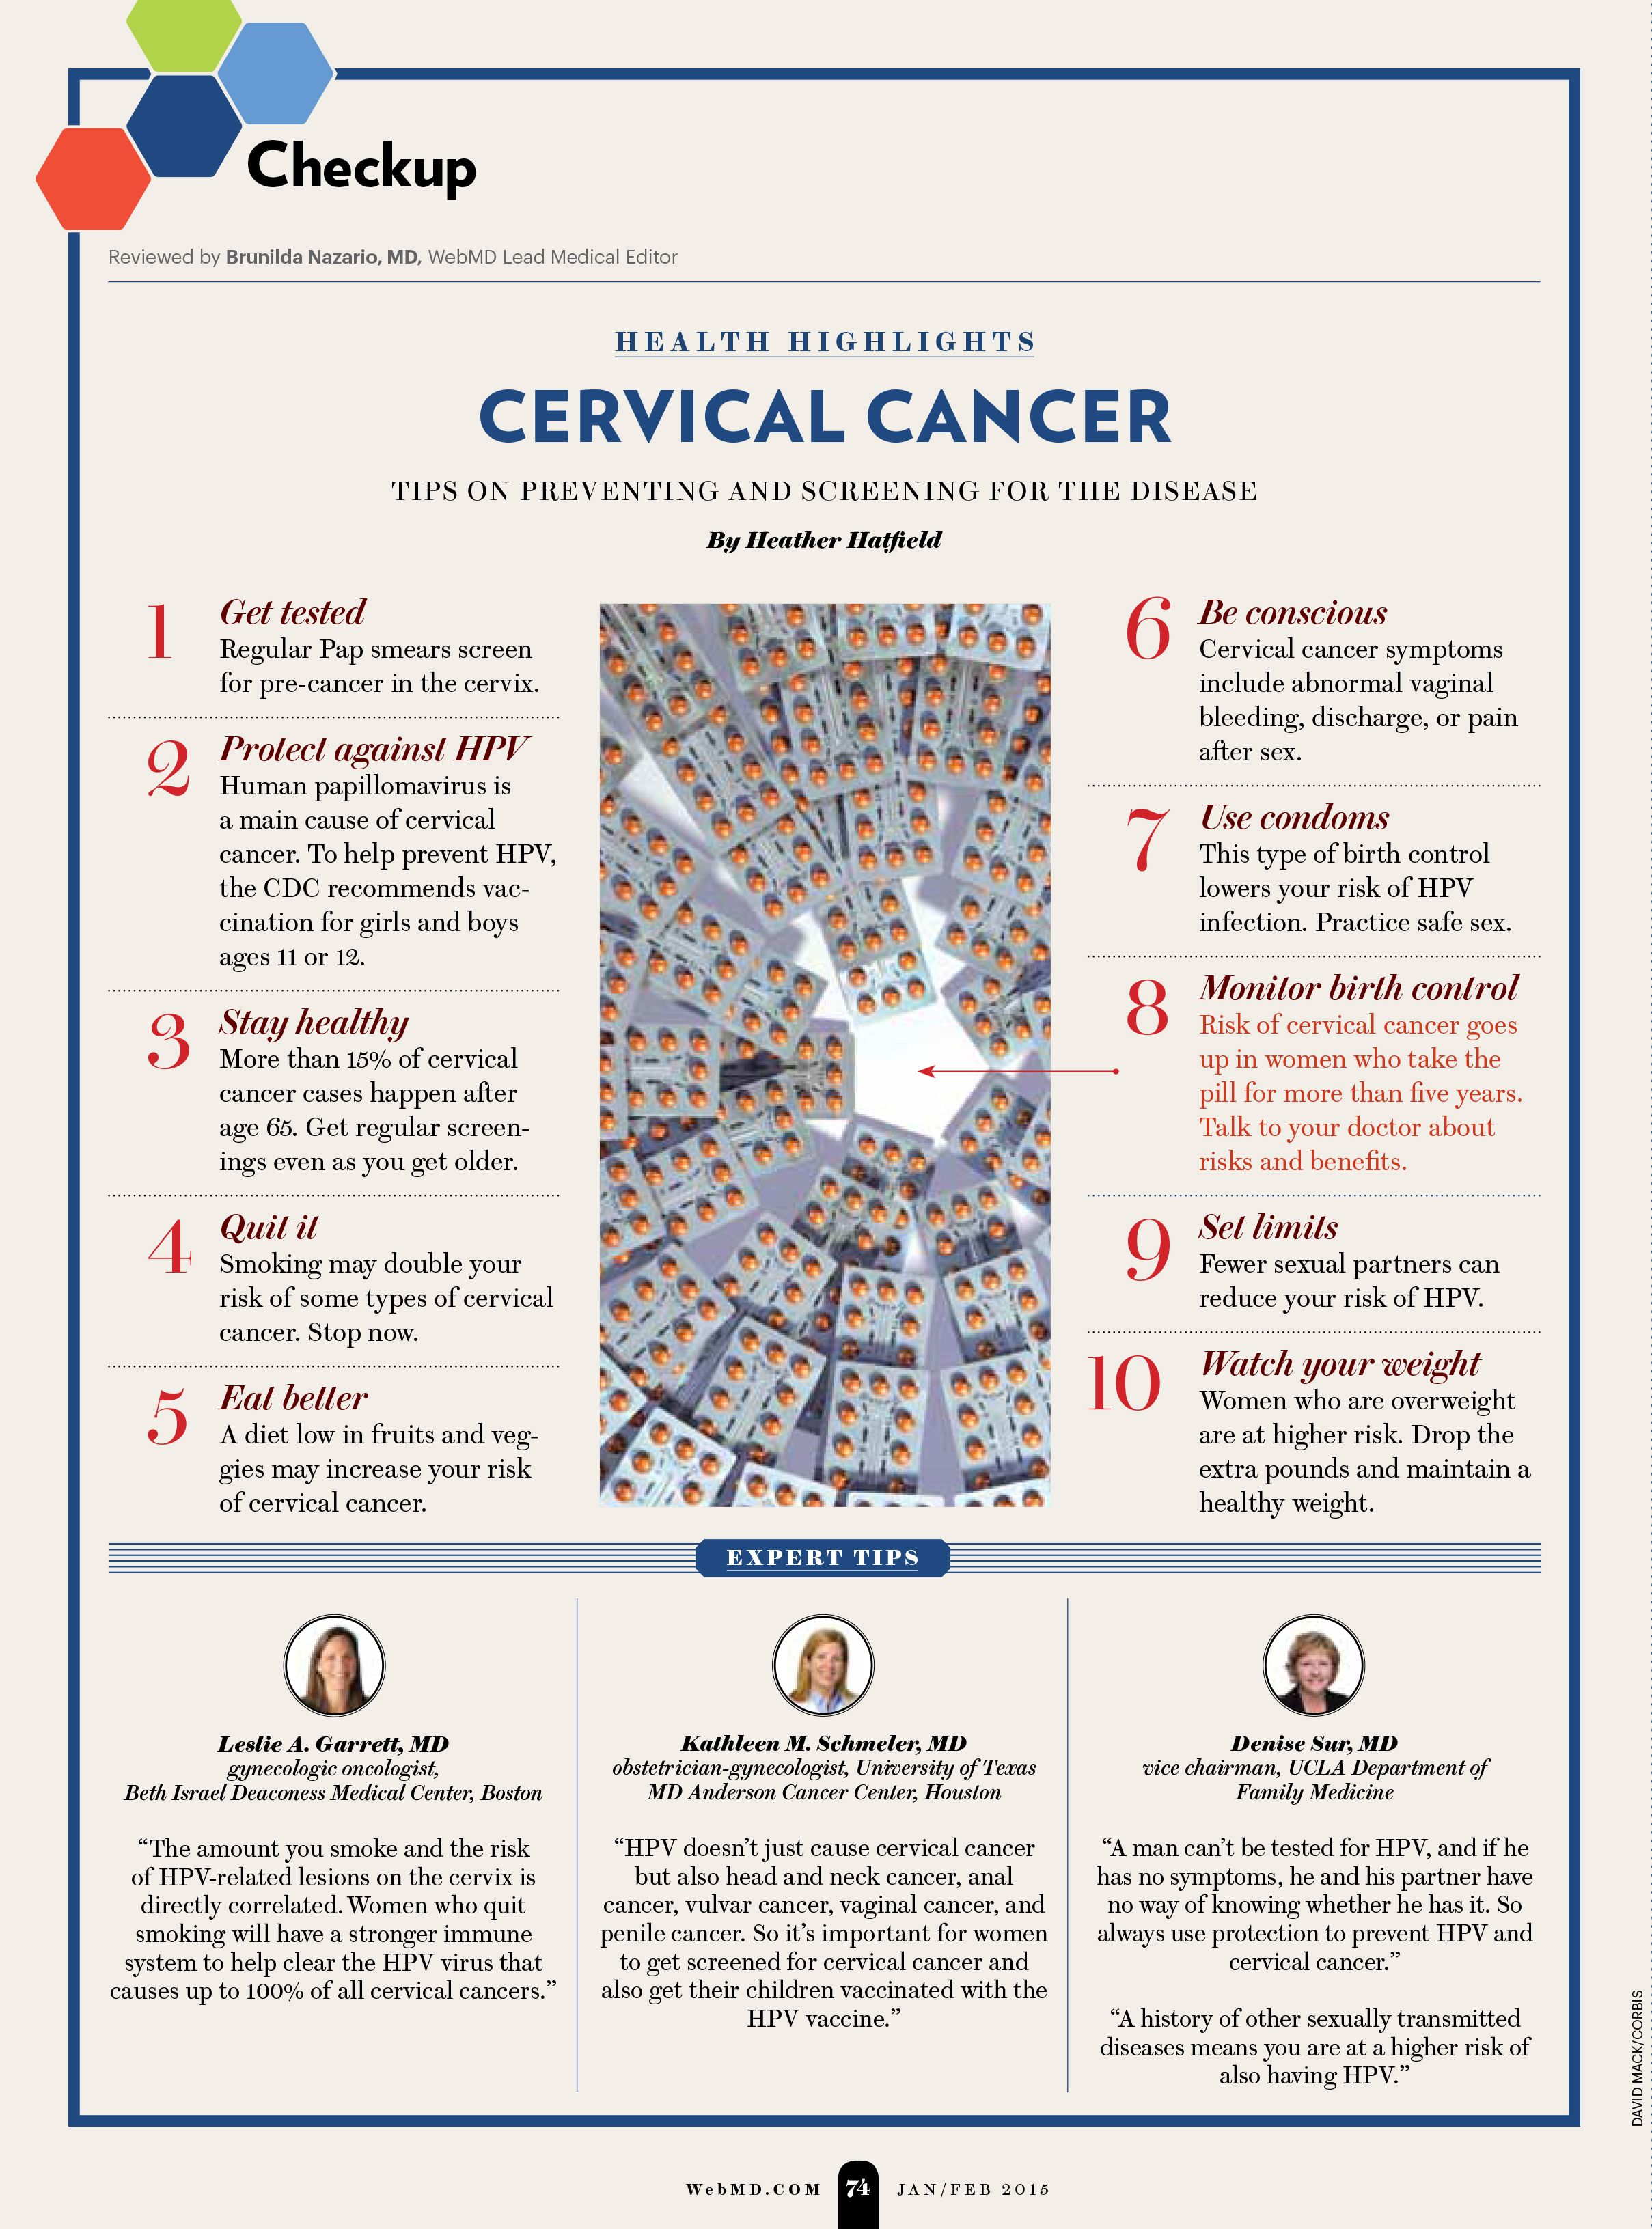 Womens Health: Cervical Cancer Prevention